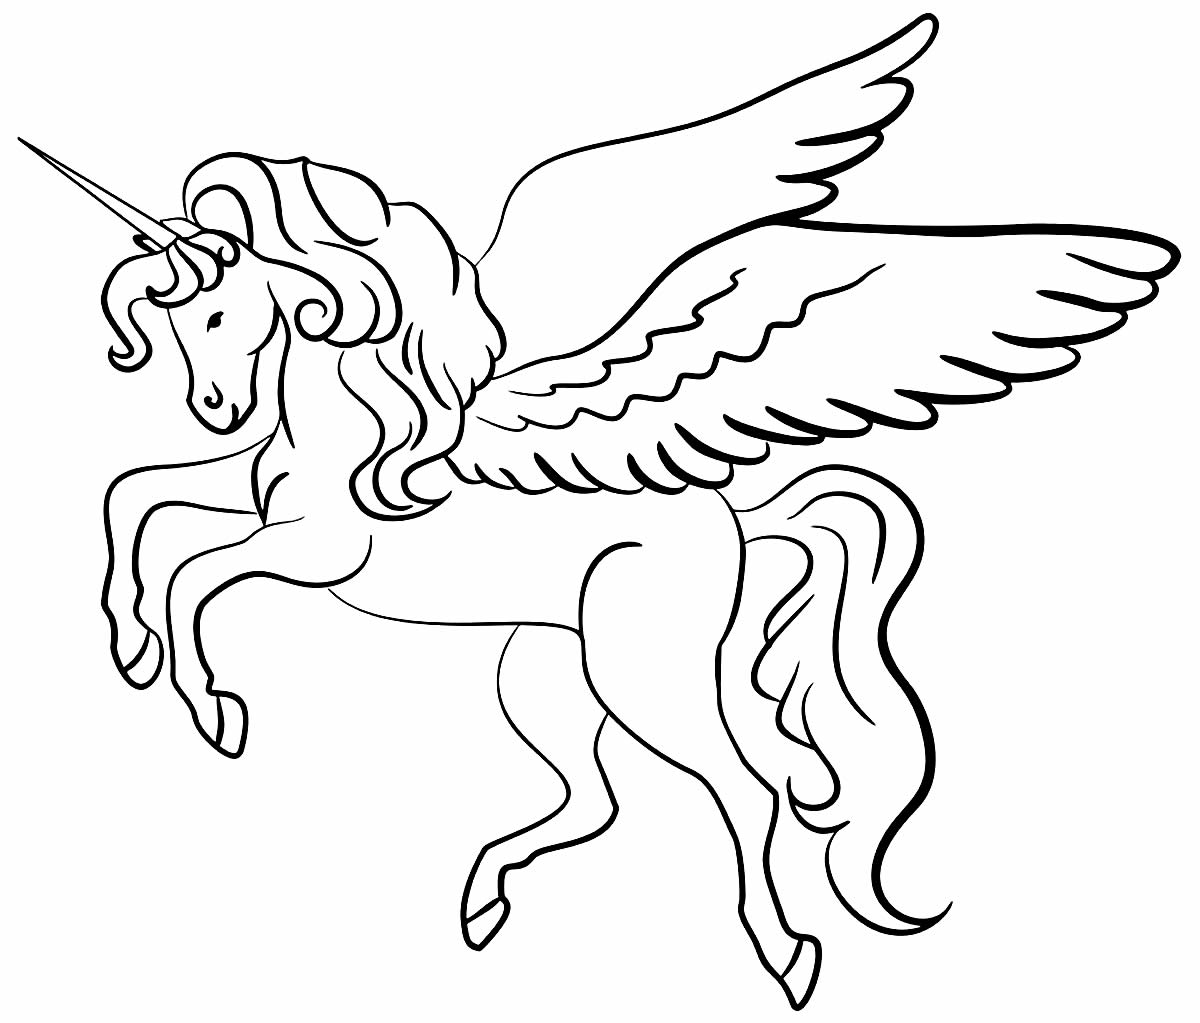 Desenho de Unicórnio para colorir